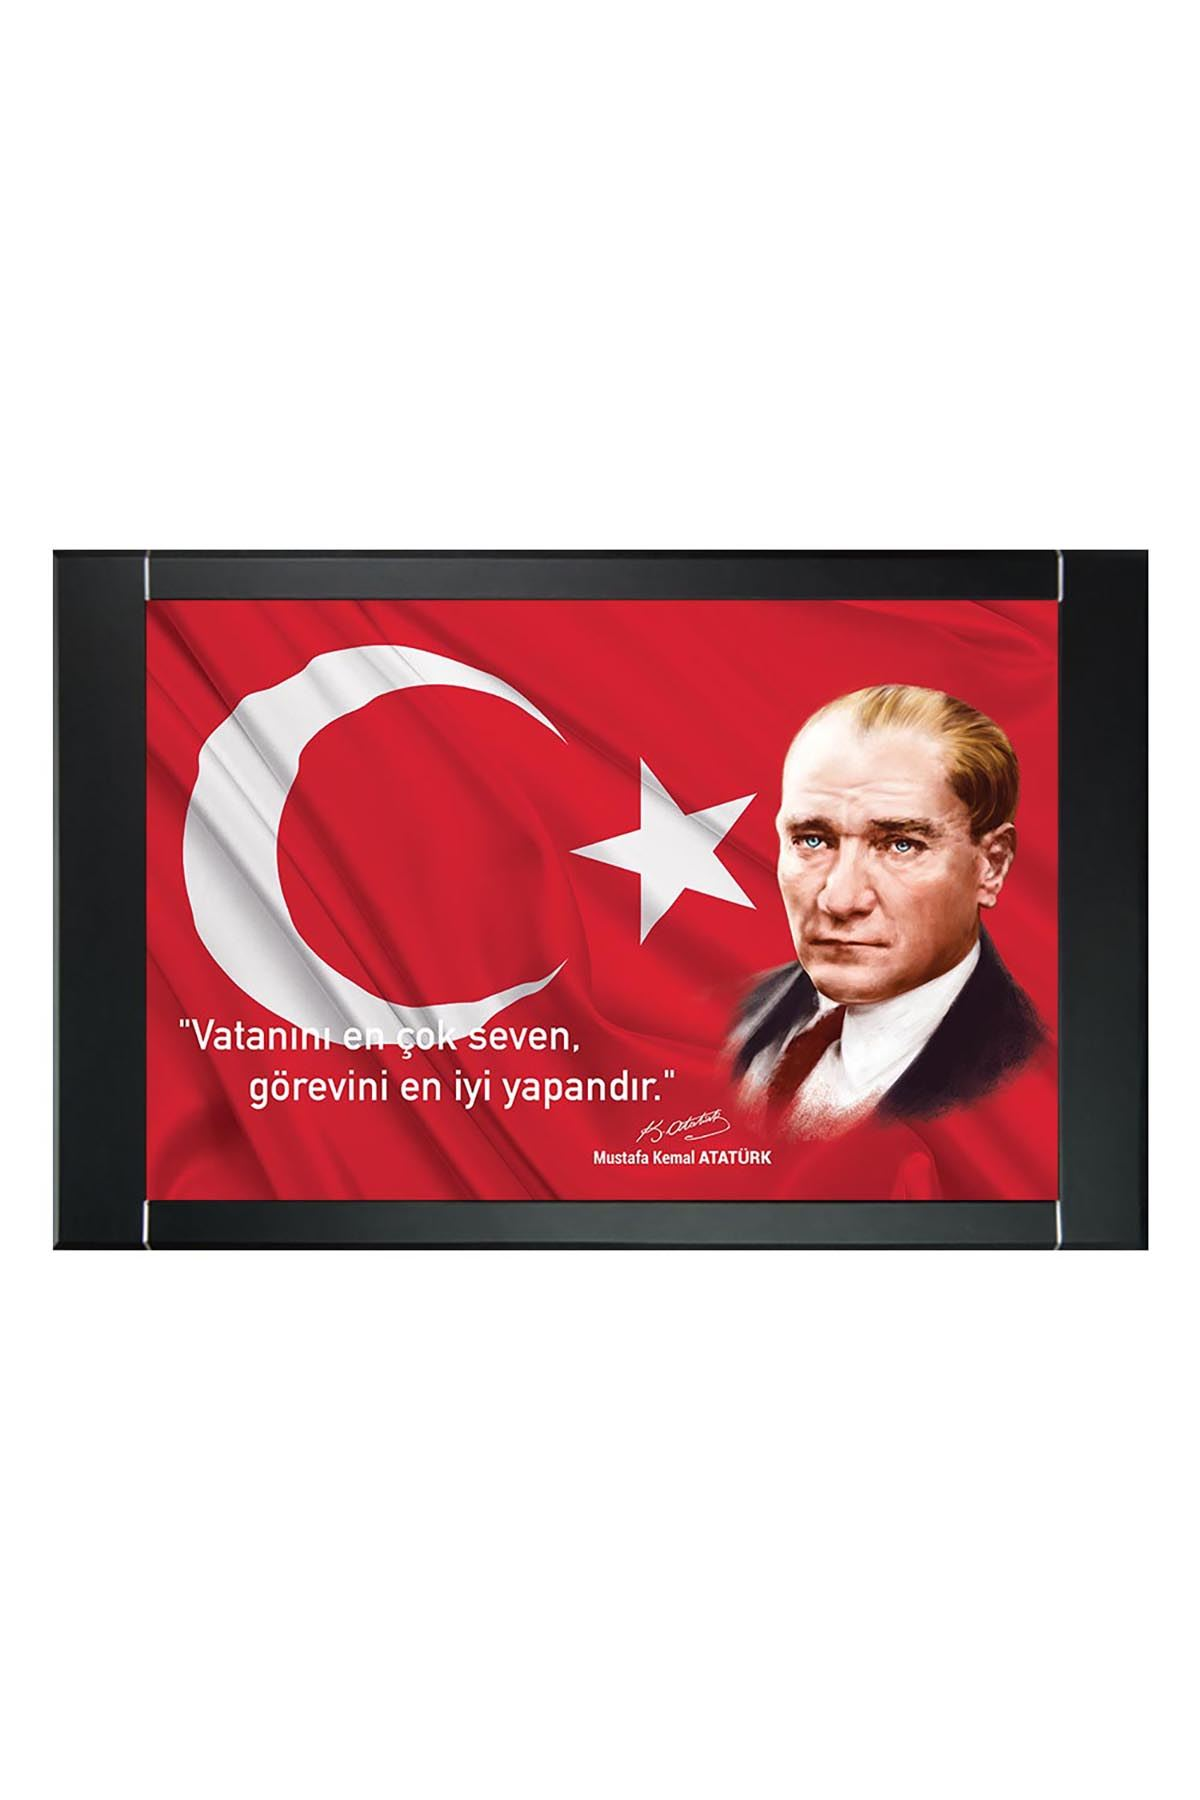 First President M. Kemal Atatürk Printed Manager Board | Printed Manager Board | Leather Framed Board | High Quality Manager Board